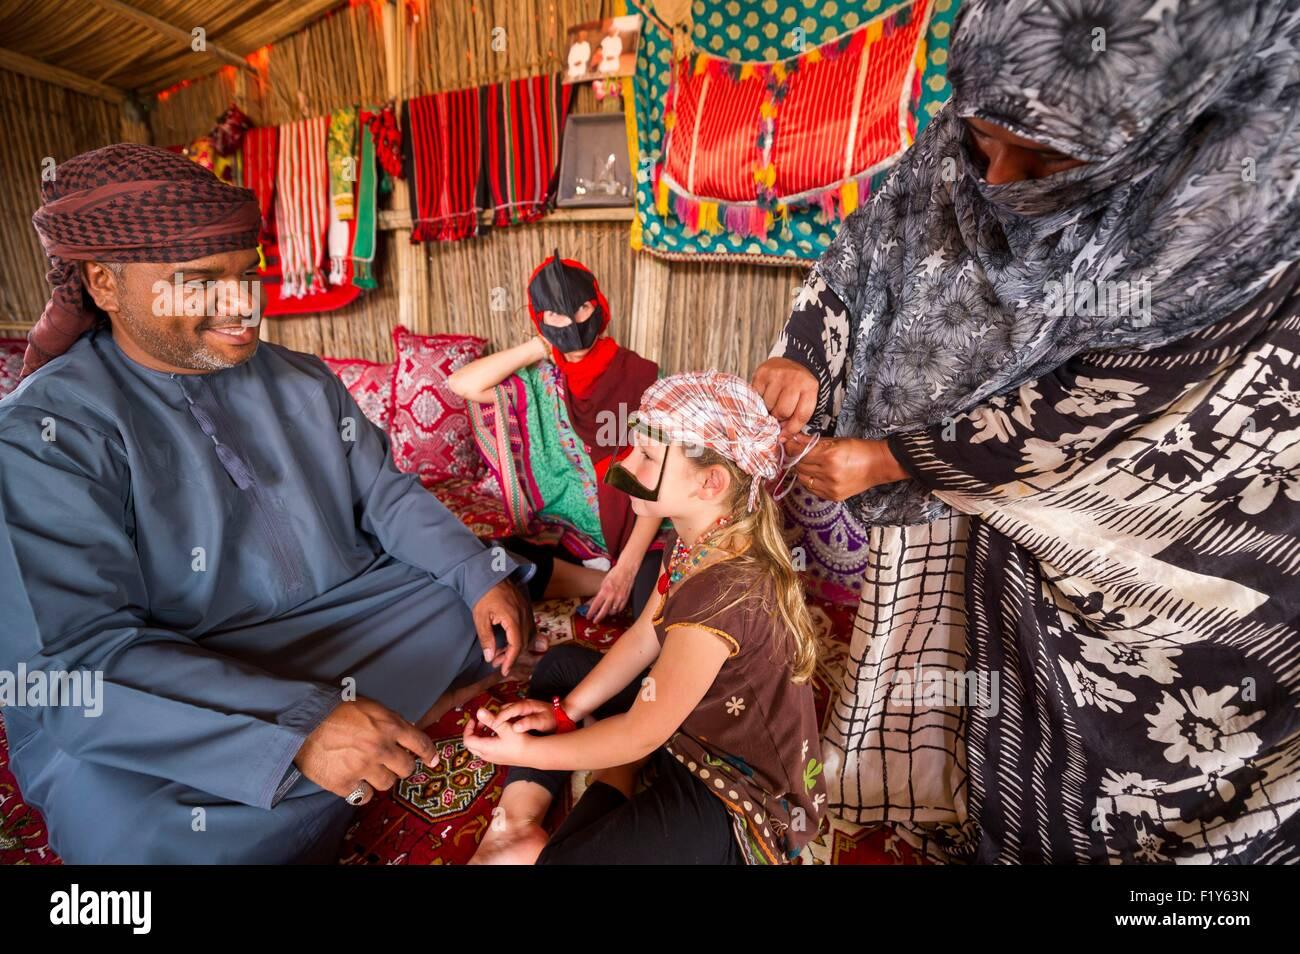 Oman, Sharquiyah Sands the Eastern Sands, Raka, beduin camp of Madam Salma - Stock Image